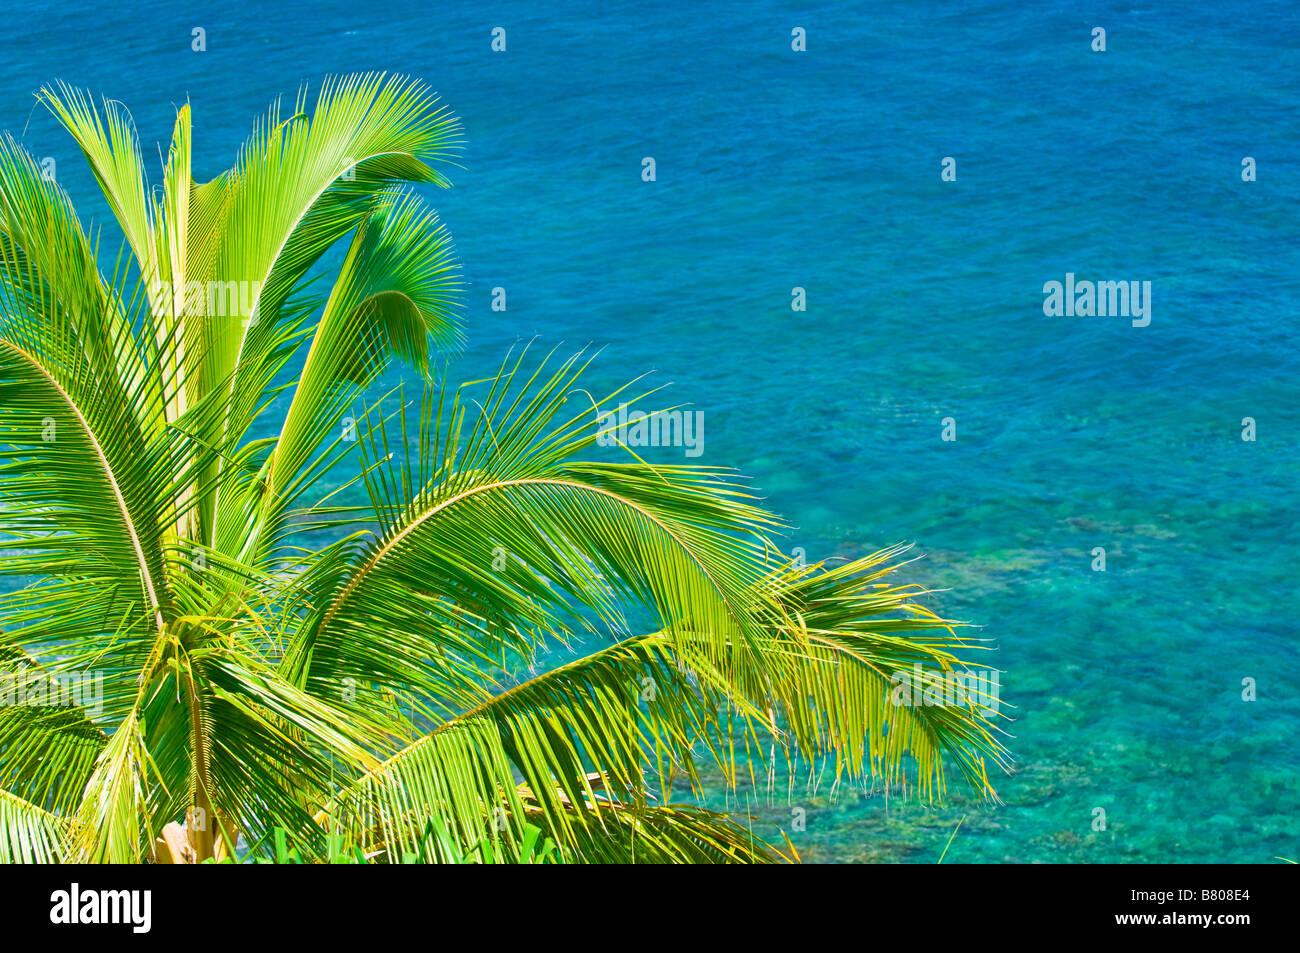 Kokospalme und blauen Pazifik Wasser bei Hideaways Strand Insel Kauai Hawaii Stockbild